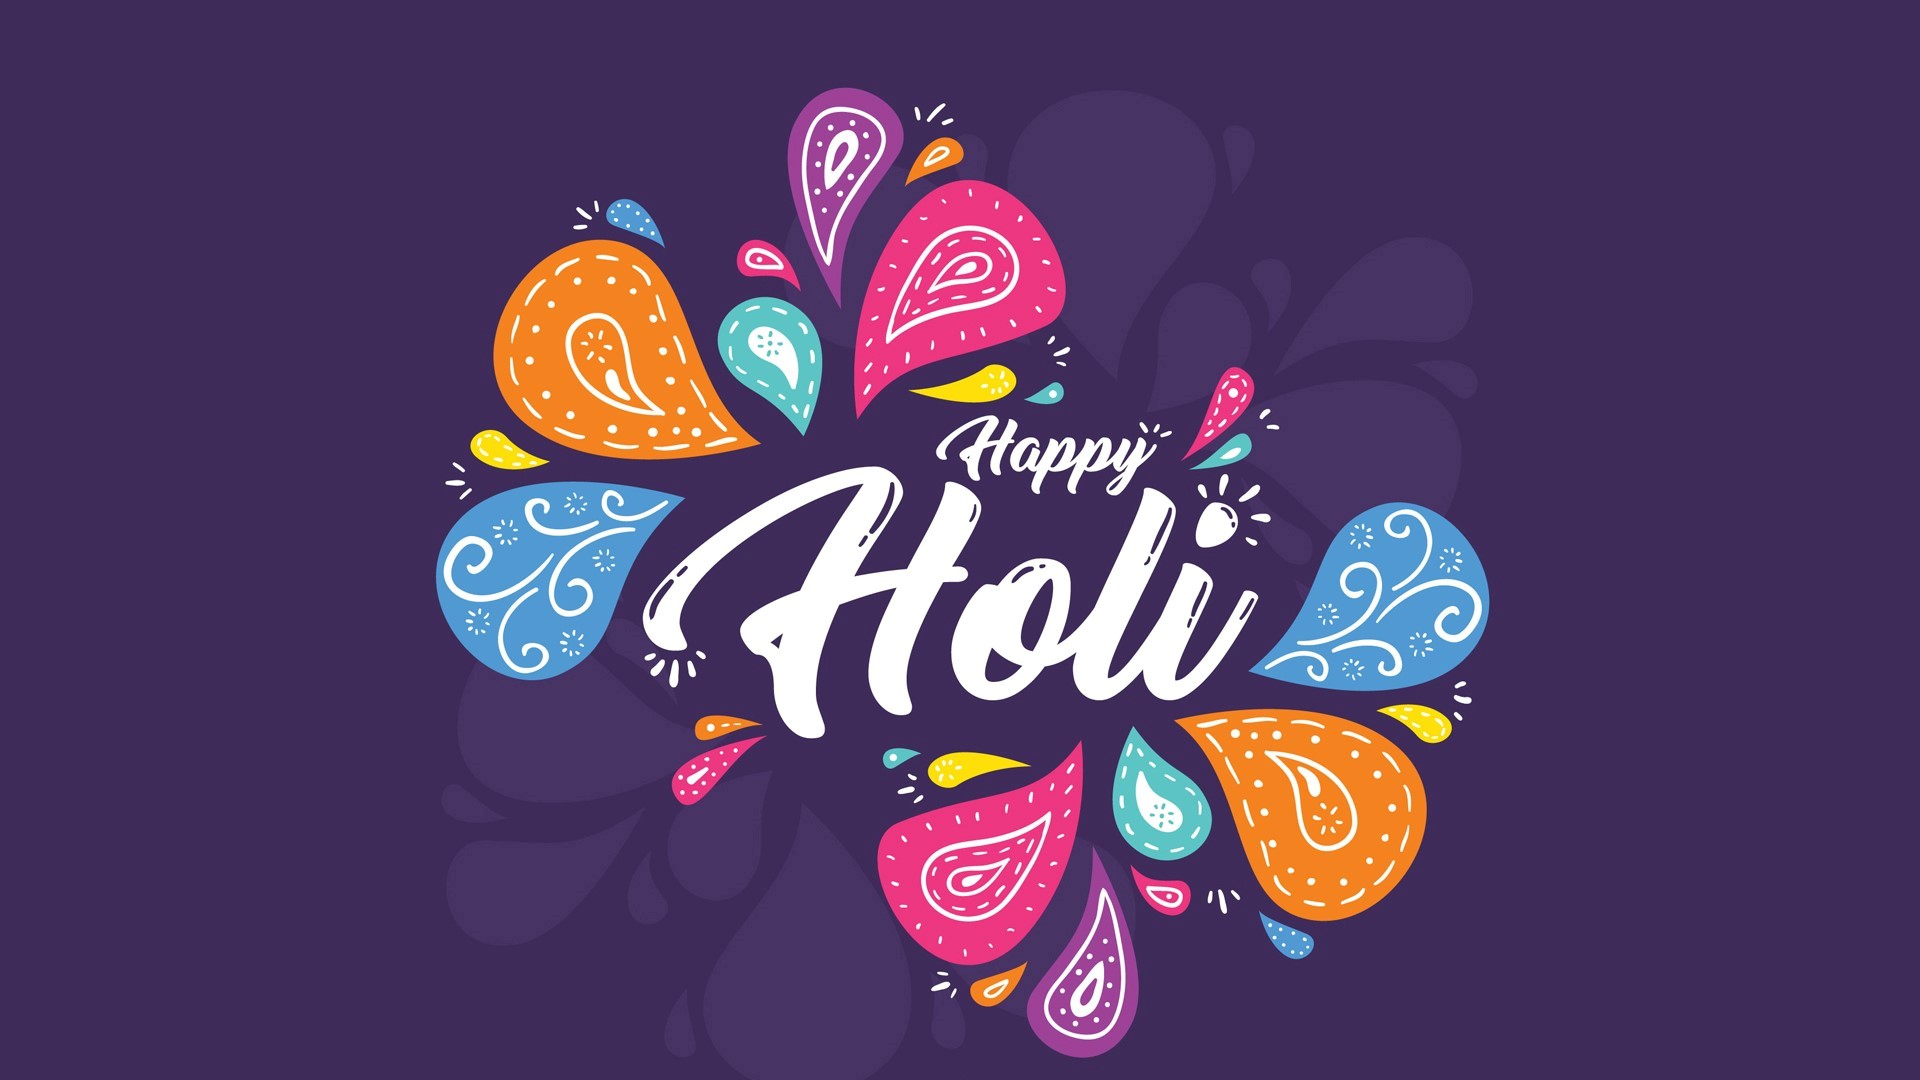 Happy Holi Festival Hd Wallpaper Happy Holi Images Hd 1920x1080 Download Hd Wallpaper Wallpapertip